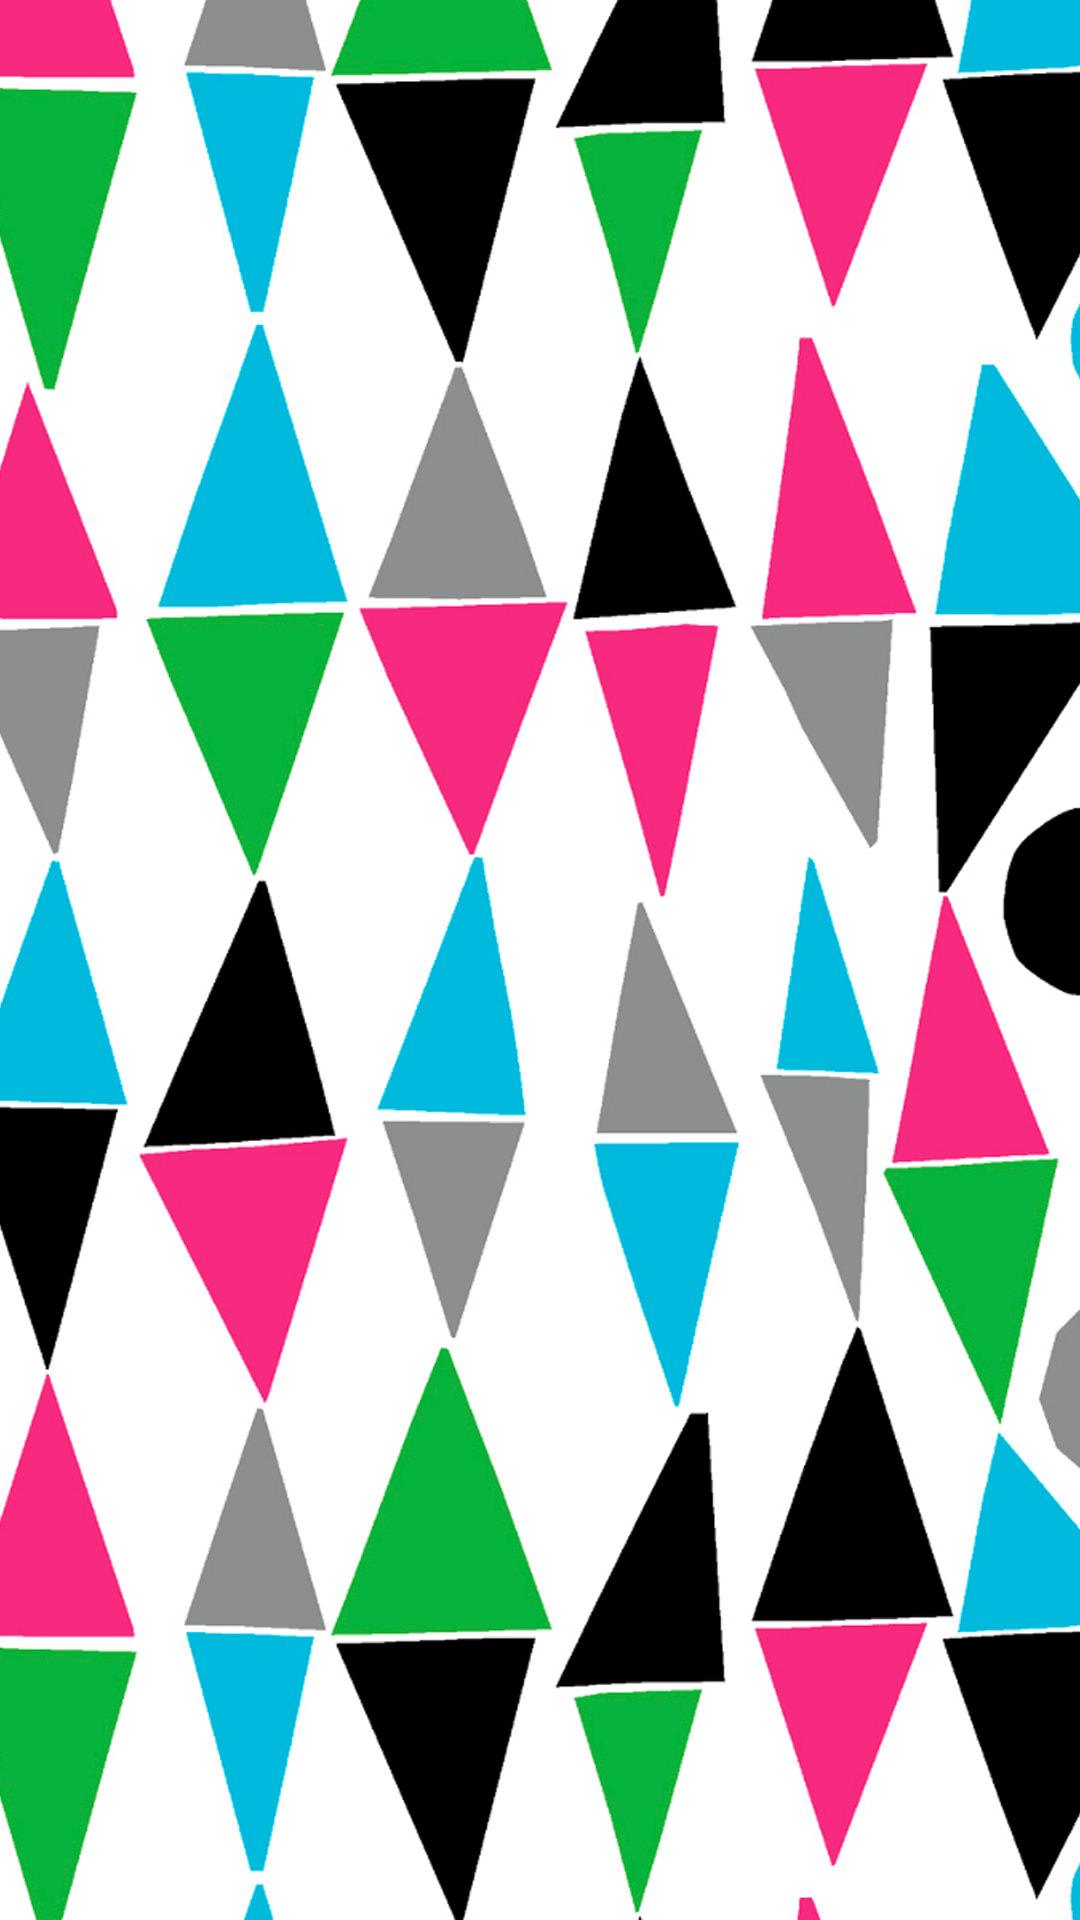 marimekko19 - marimekko[マリメッコ]の高画質スマホ壁紙25枚